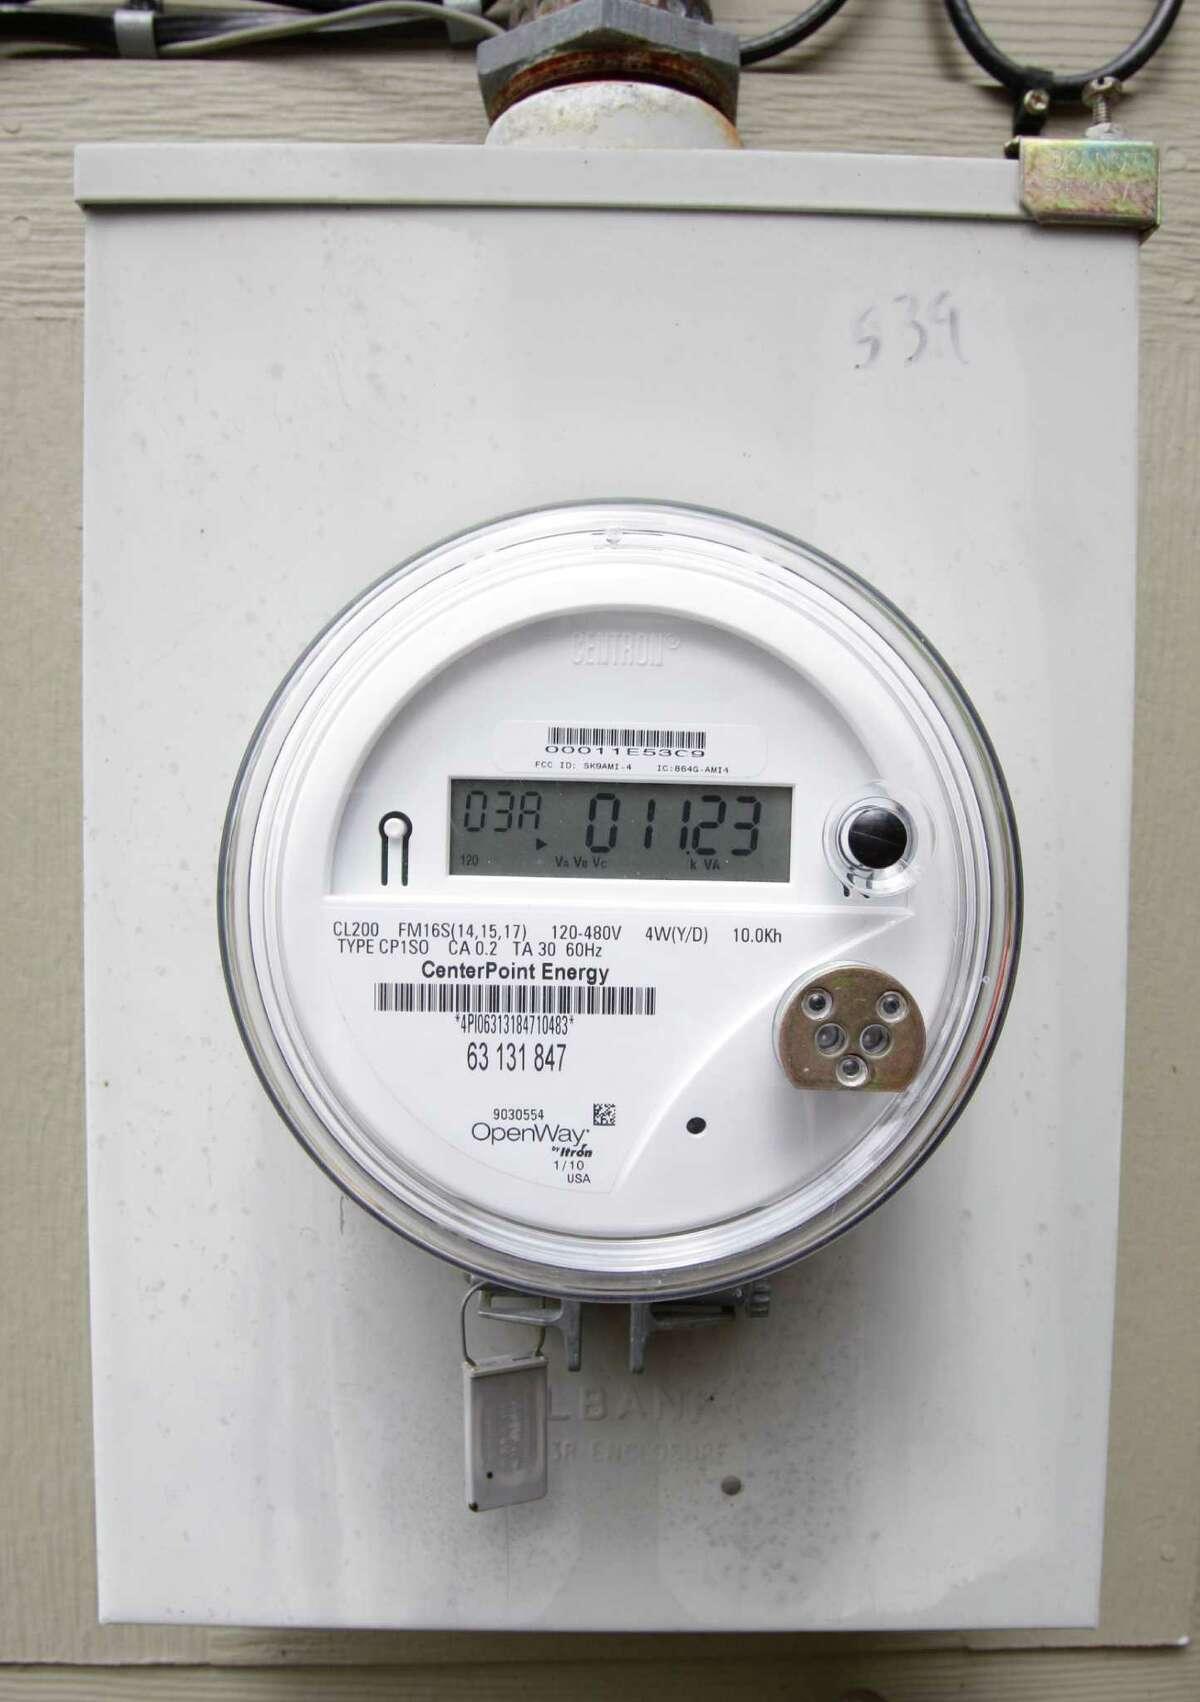 CenterPoint began installing smart meters in Houston in 2009.